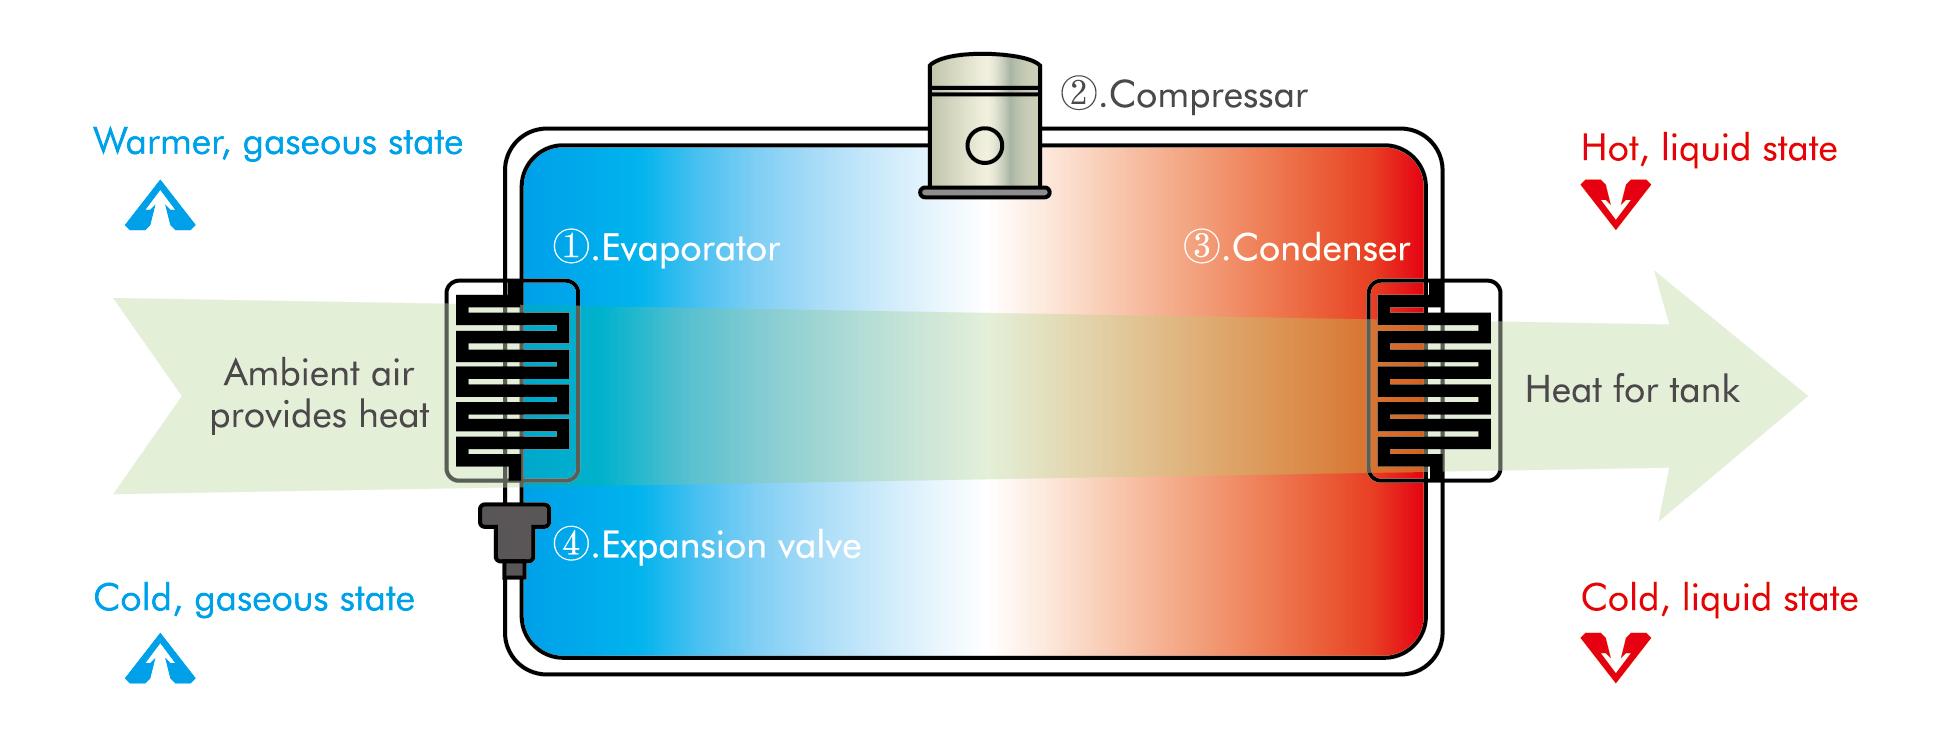 GMO Water Heater | Aircon Water Heater Tank - GMO Water Heater